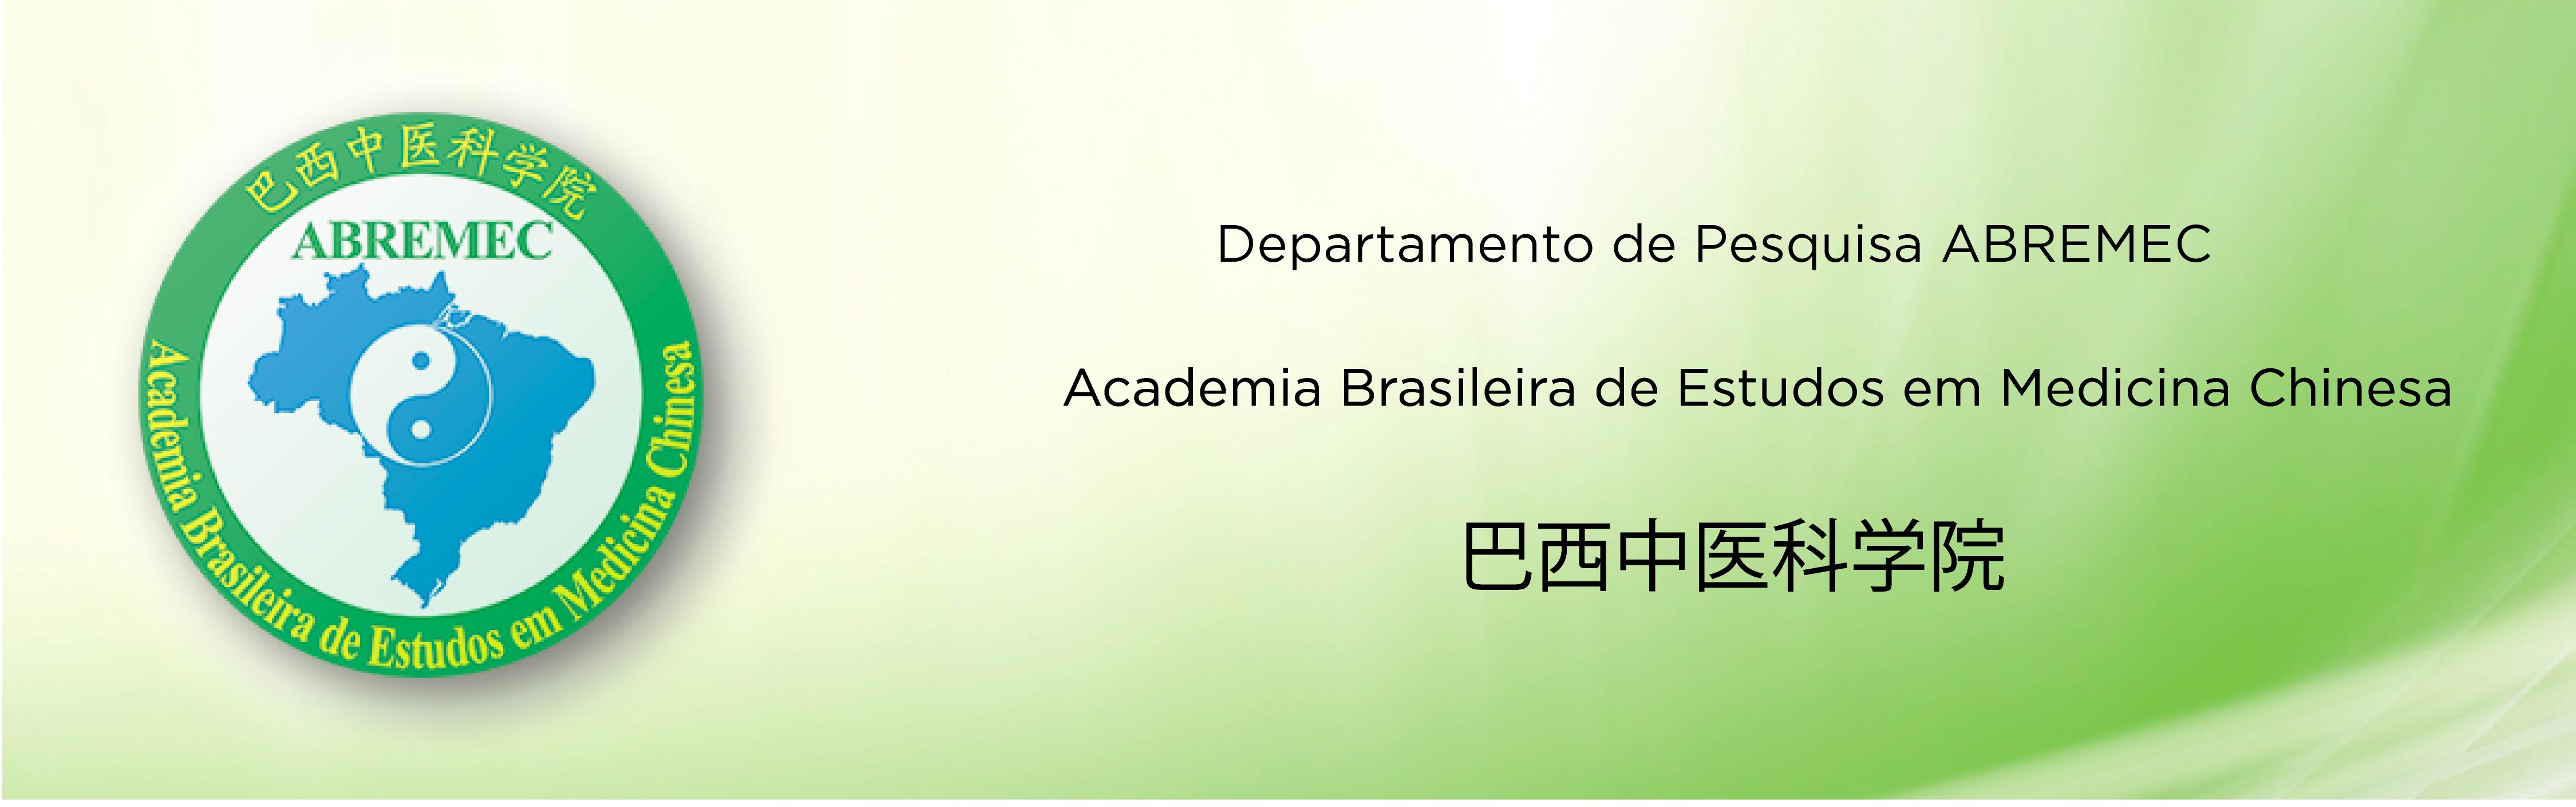 Sem-título-1_Prancheta-1-1 ABREMEC